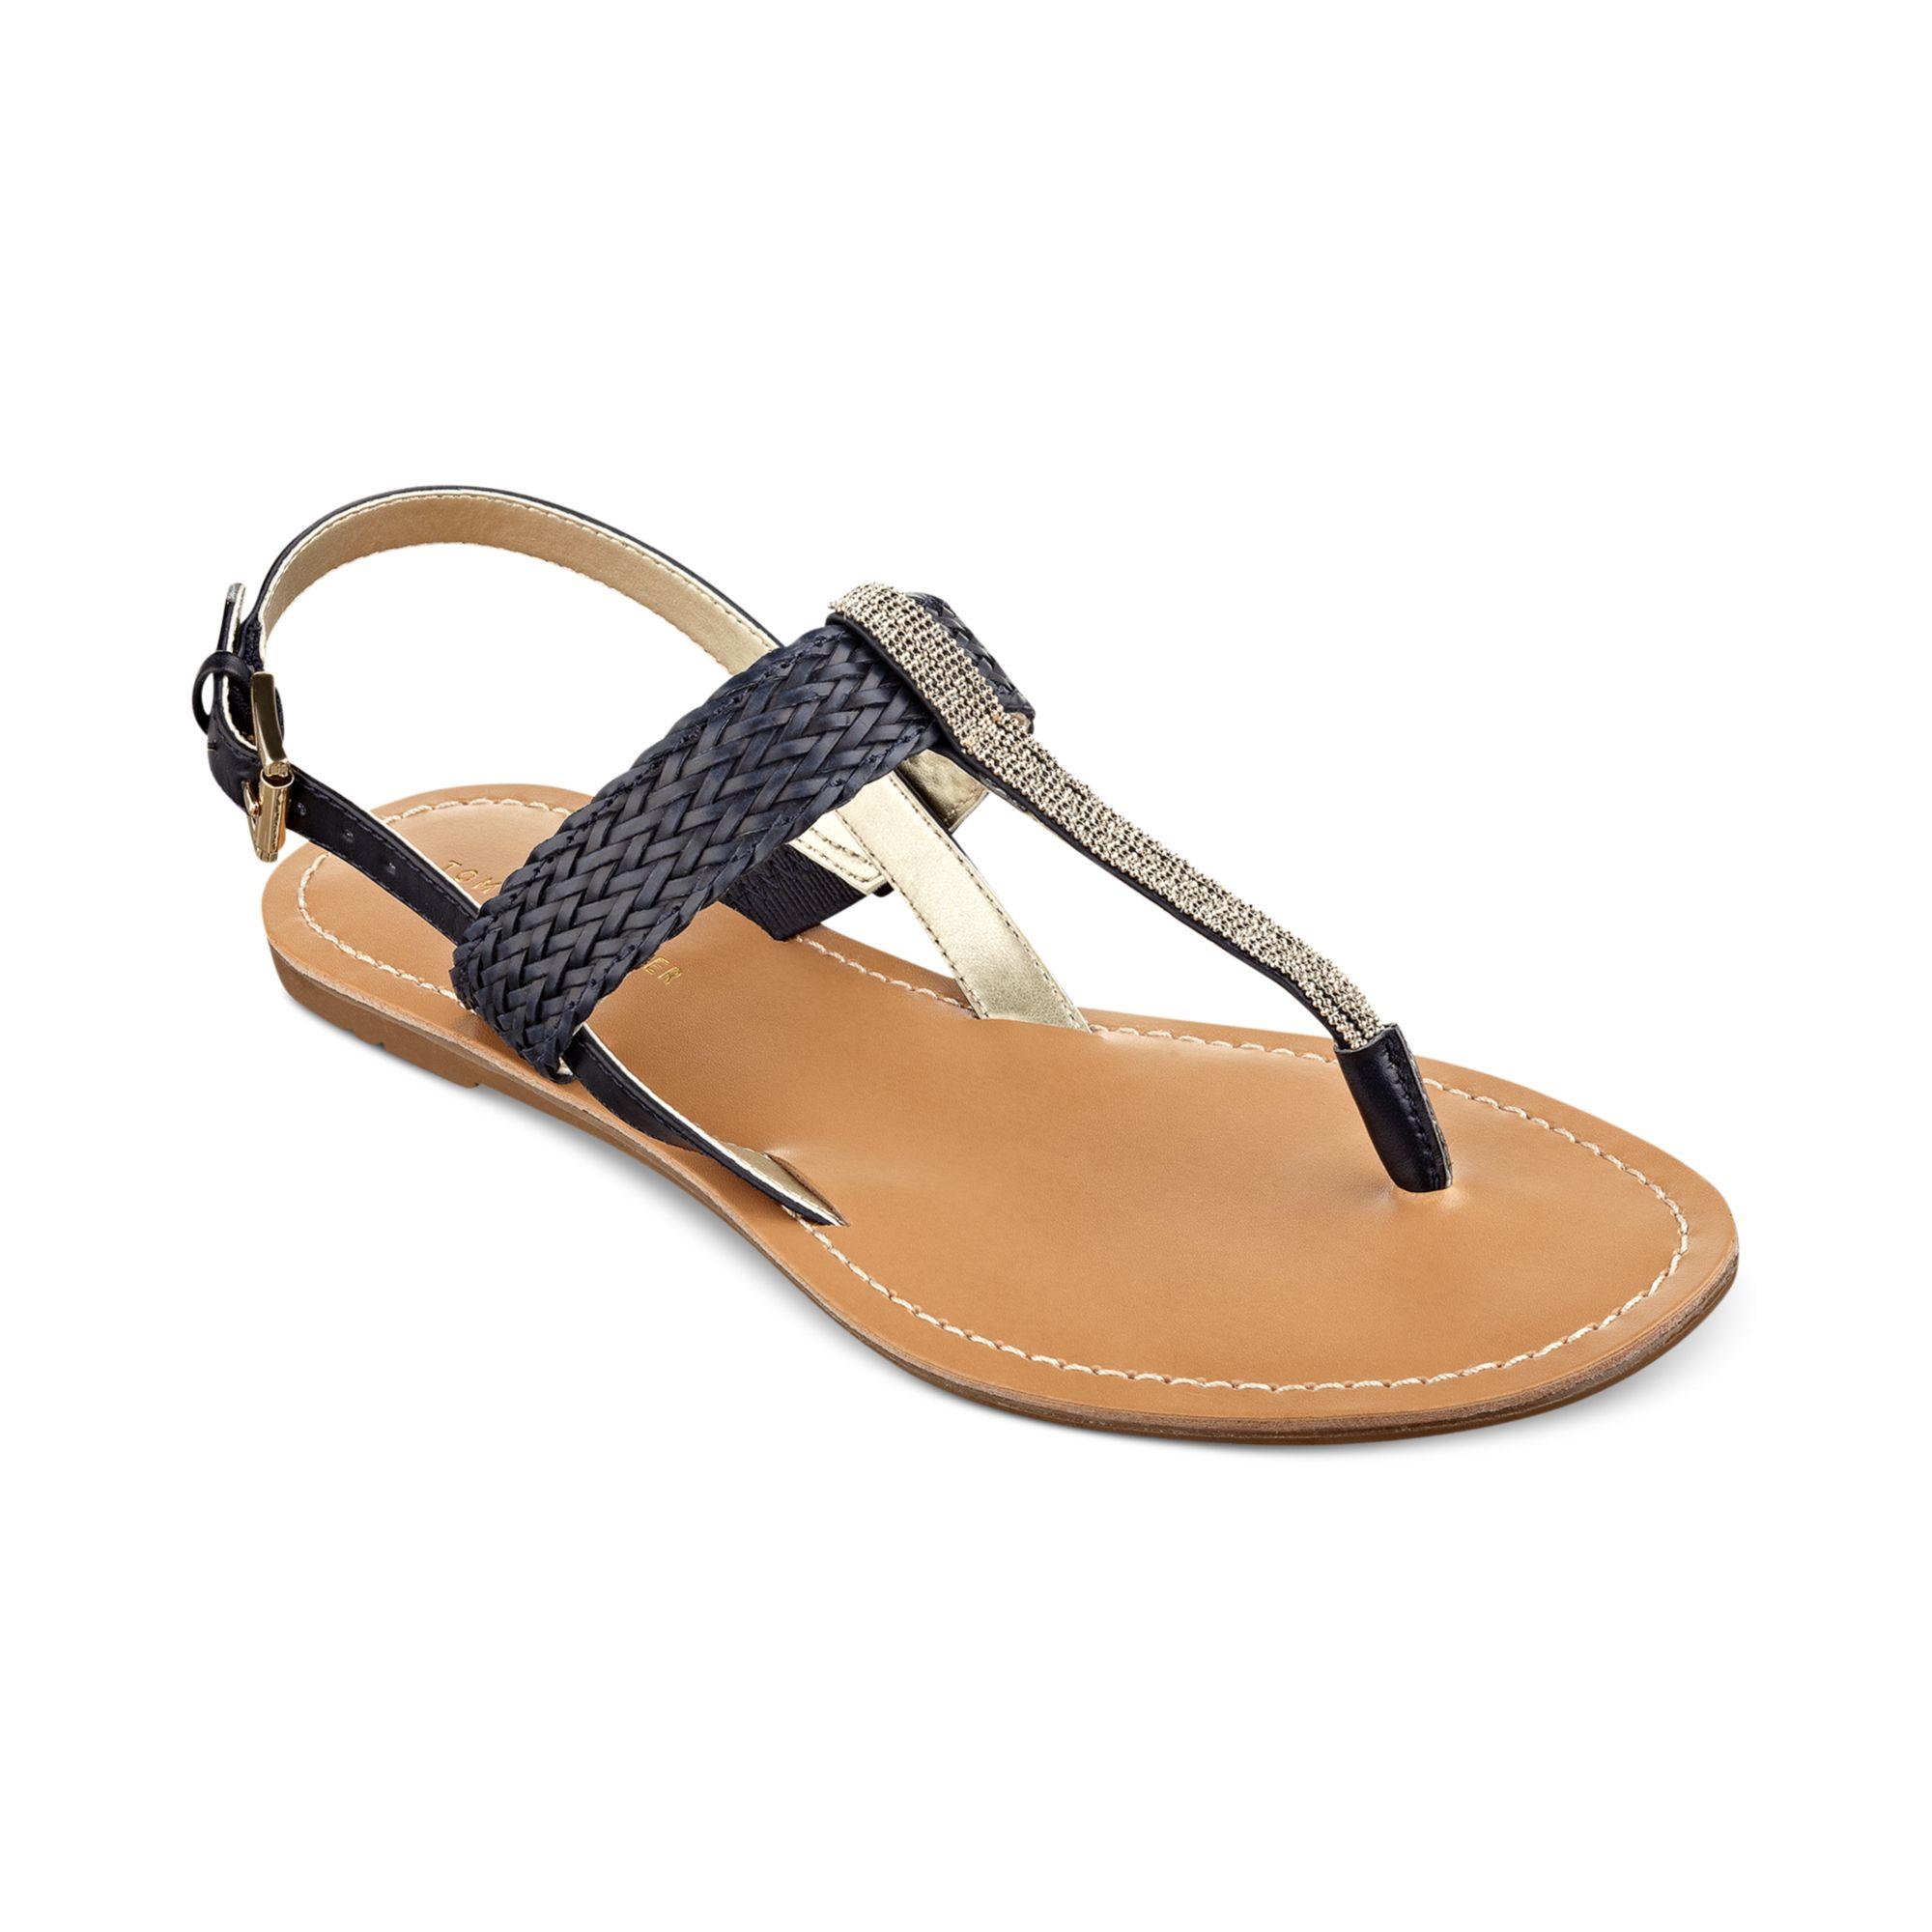 Model Clothes Shoes Amp Accessories Gt Women39s Shoes Gt Heels